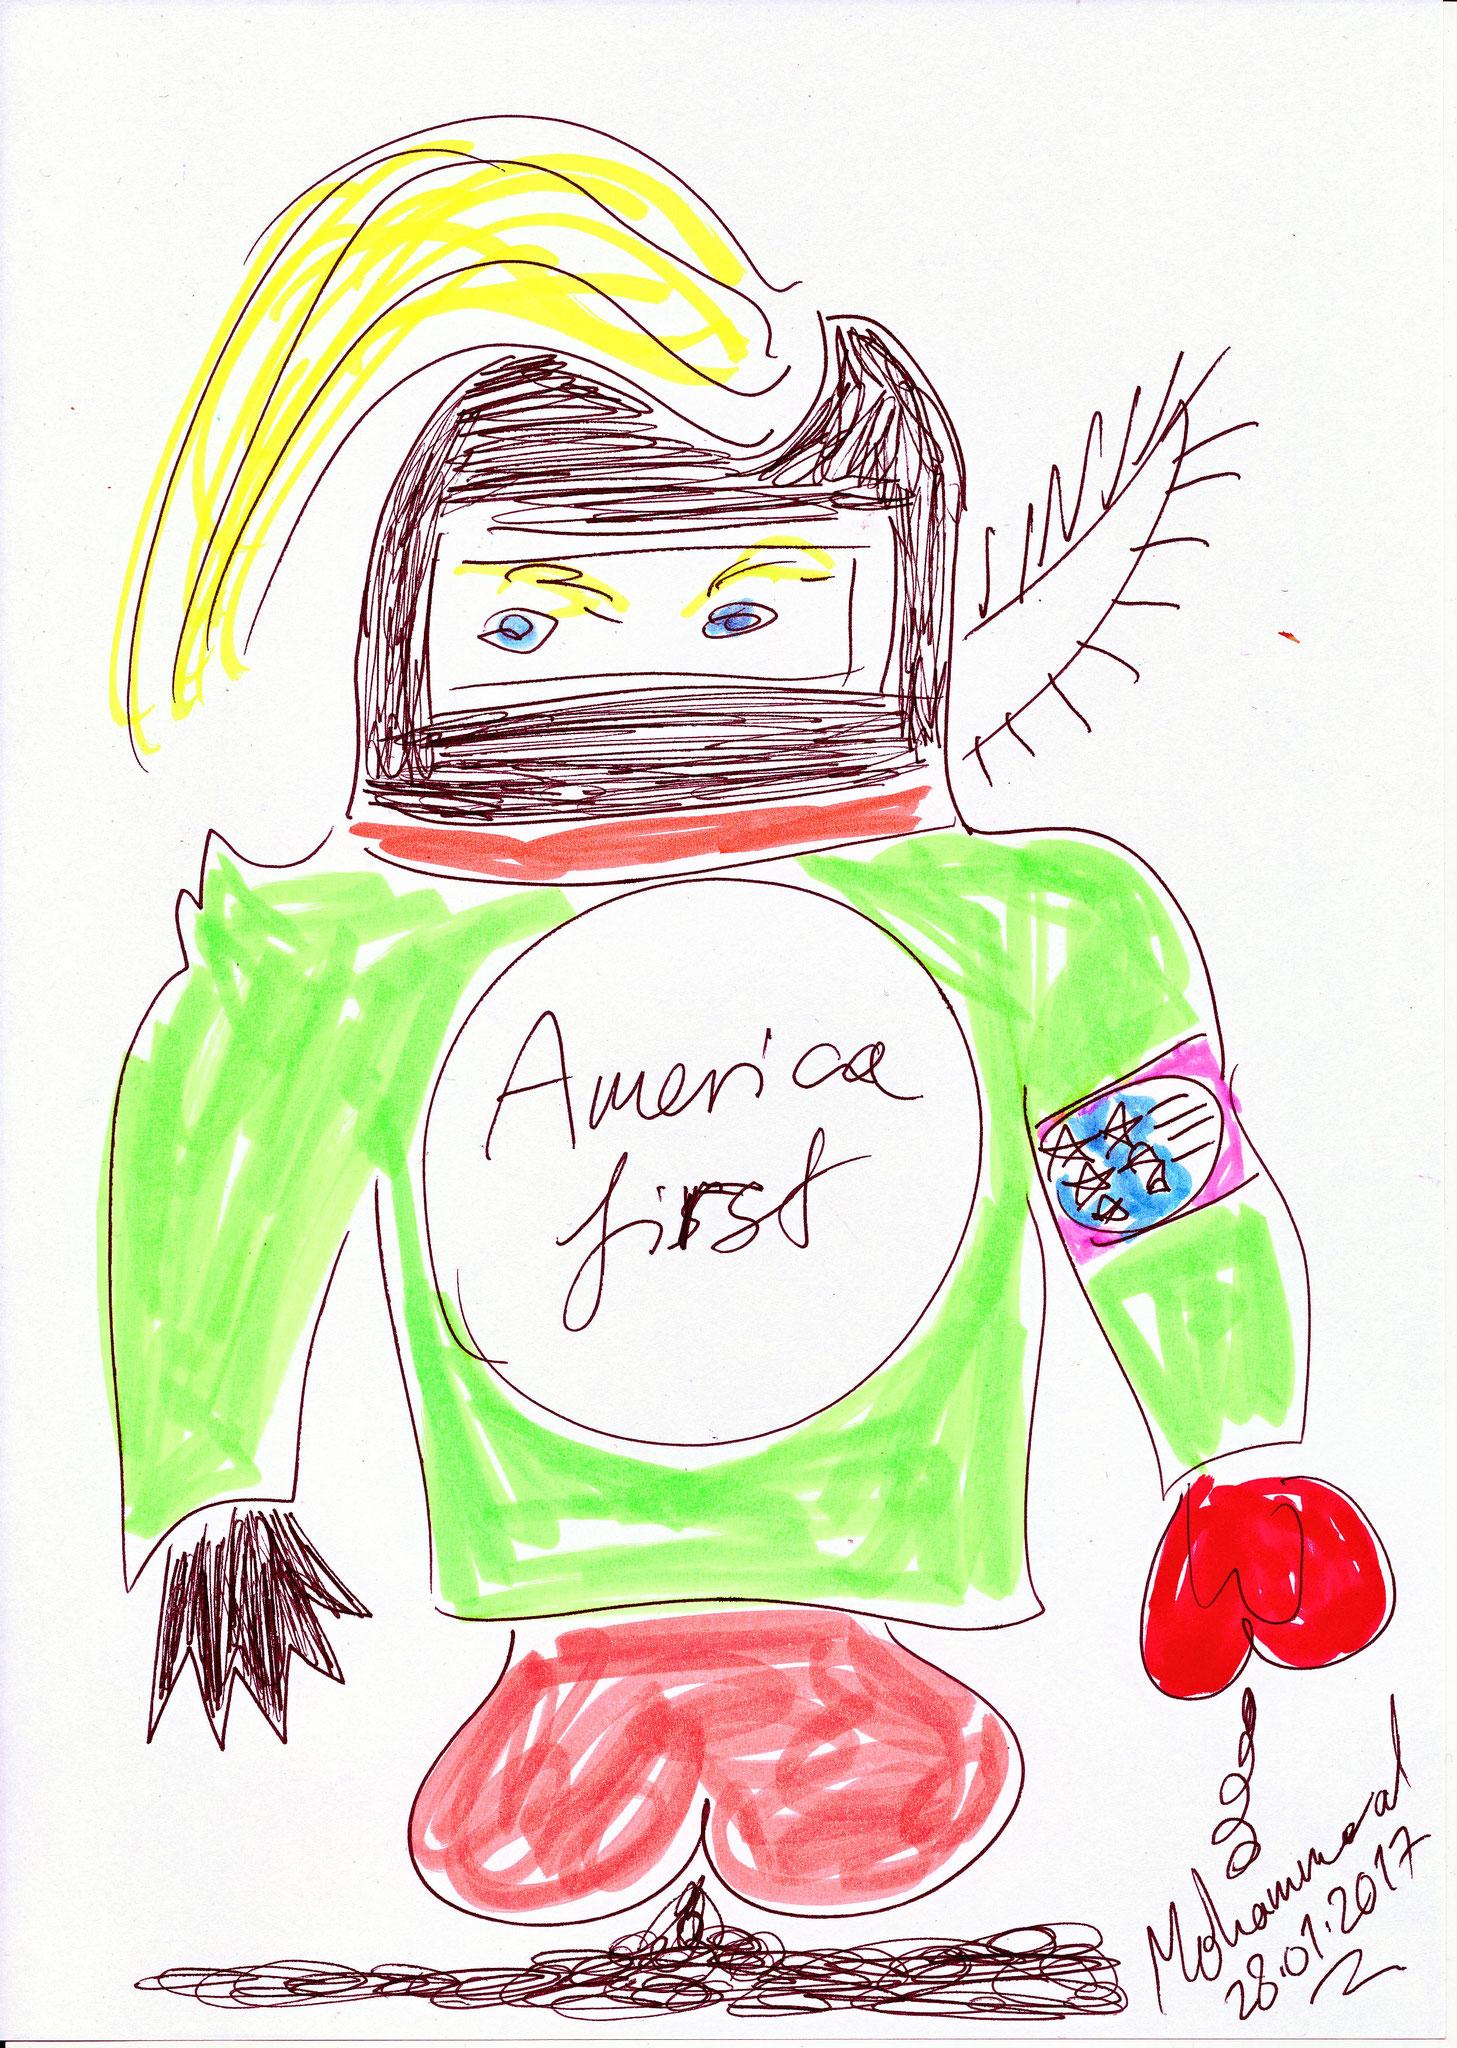 America first2